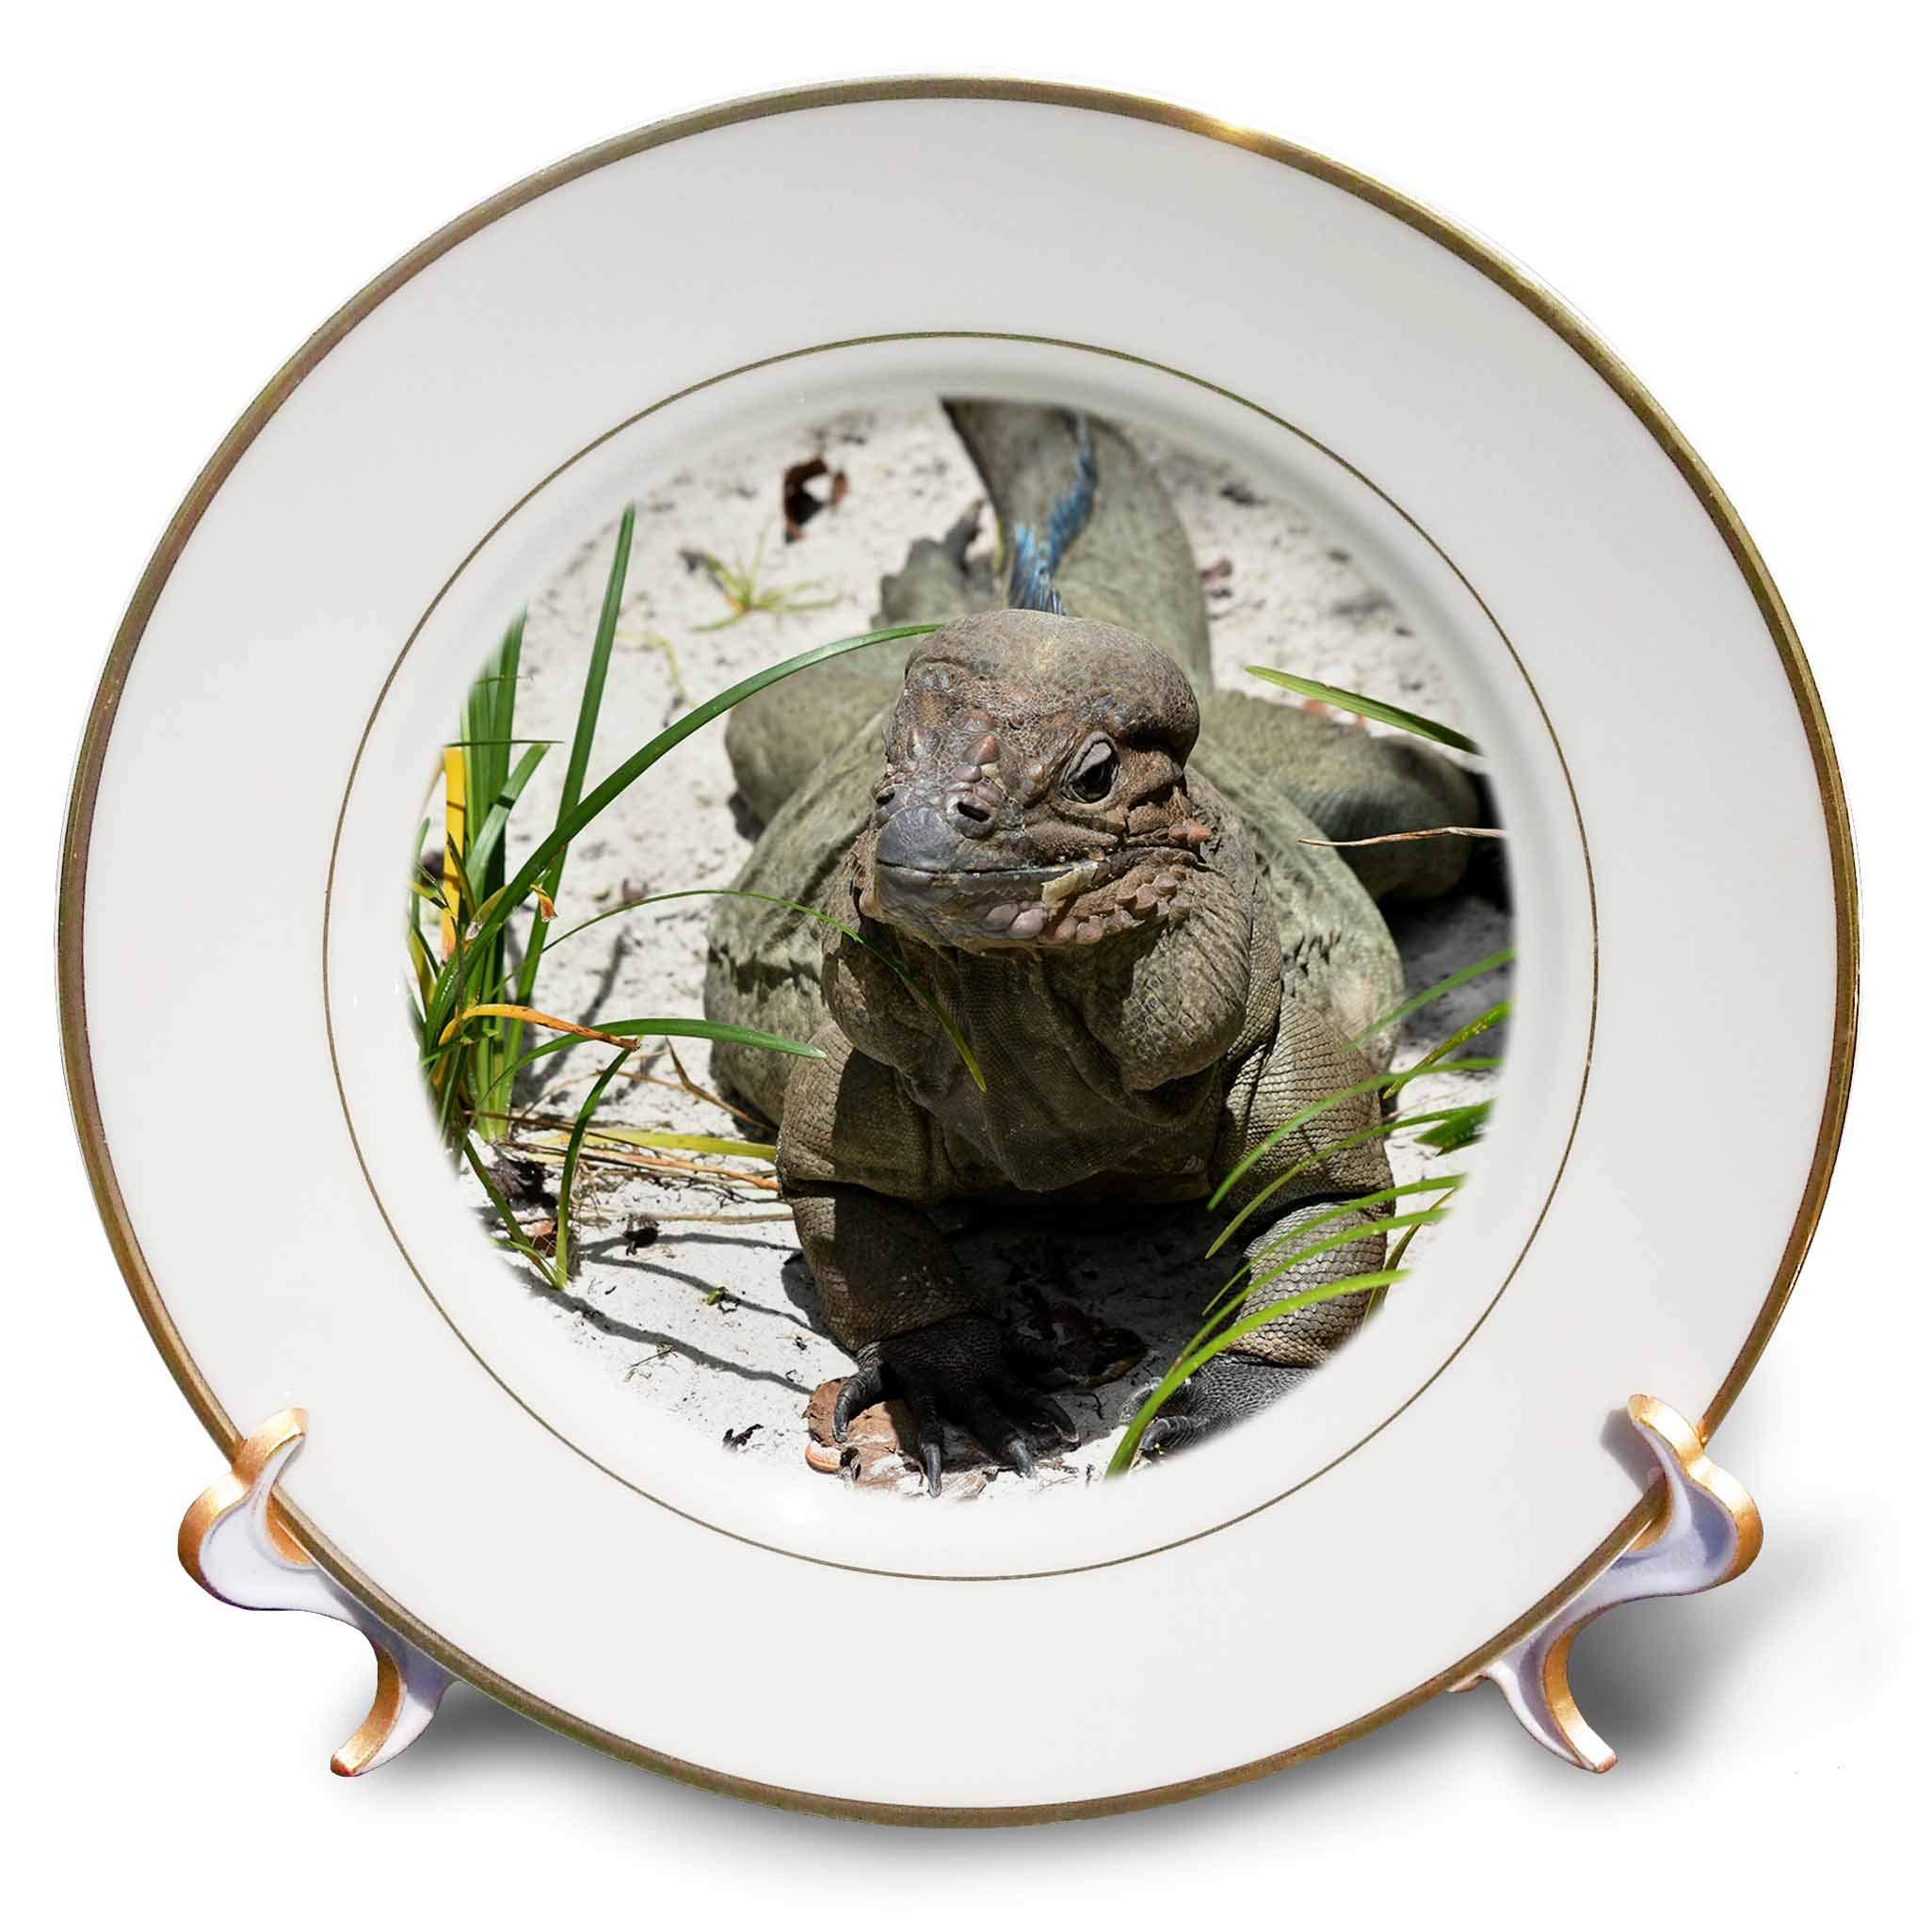 3dRose Susans Zoo Crew Animal - Rhinocerous Iguana Lizard on Sand Animal - 8 inch Porcelain Plate (cp_294899_1)